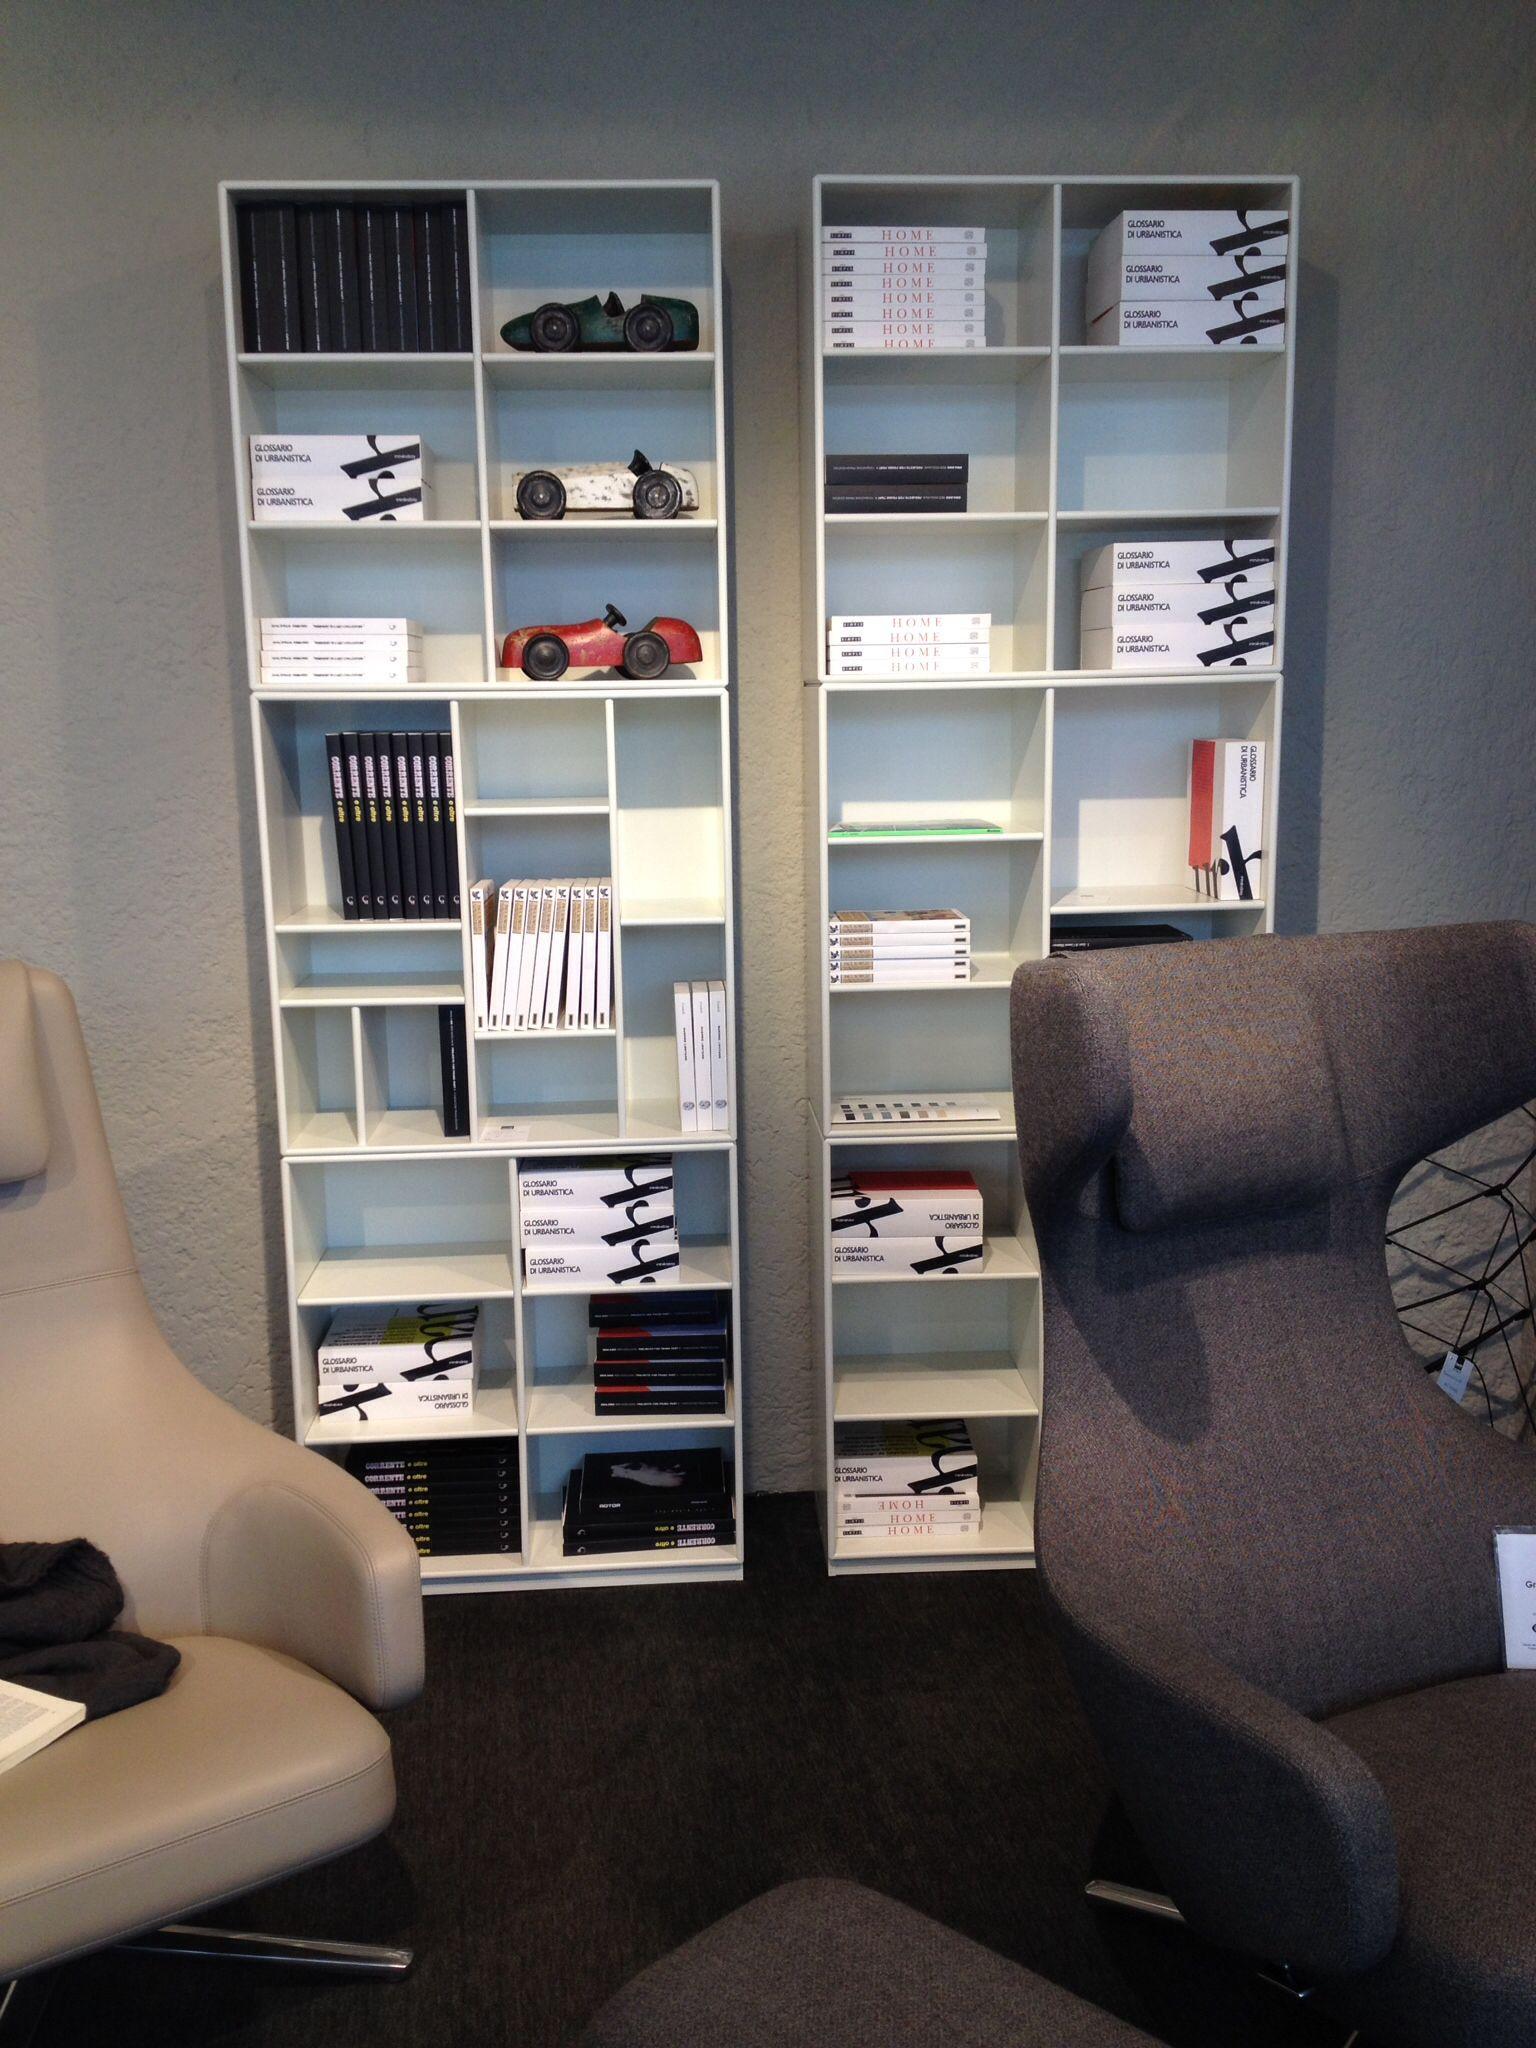 Montana Möbelbausystem Aus Dänemark Erhältlich Bei Hecht